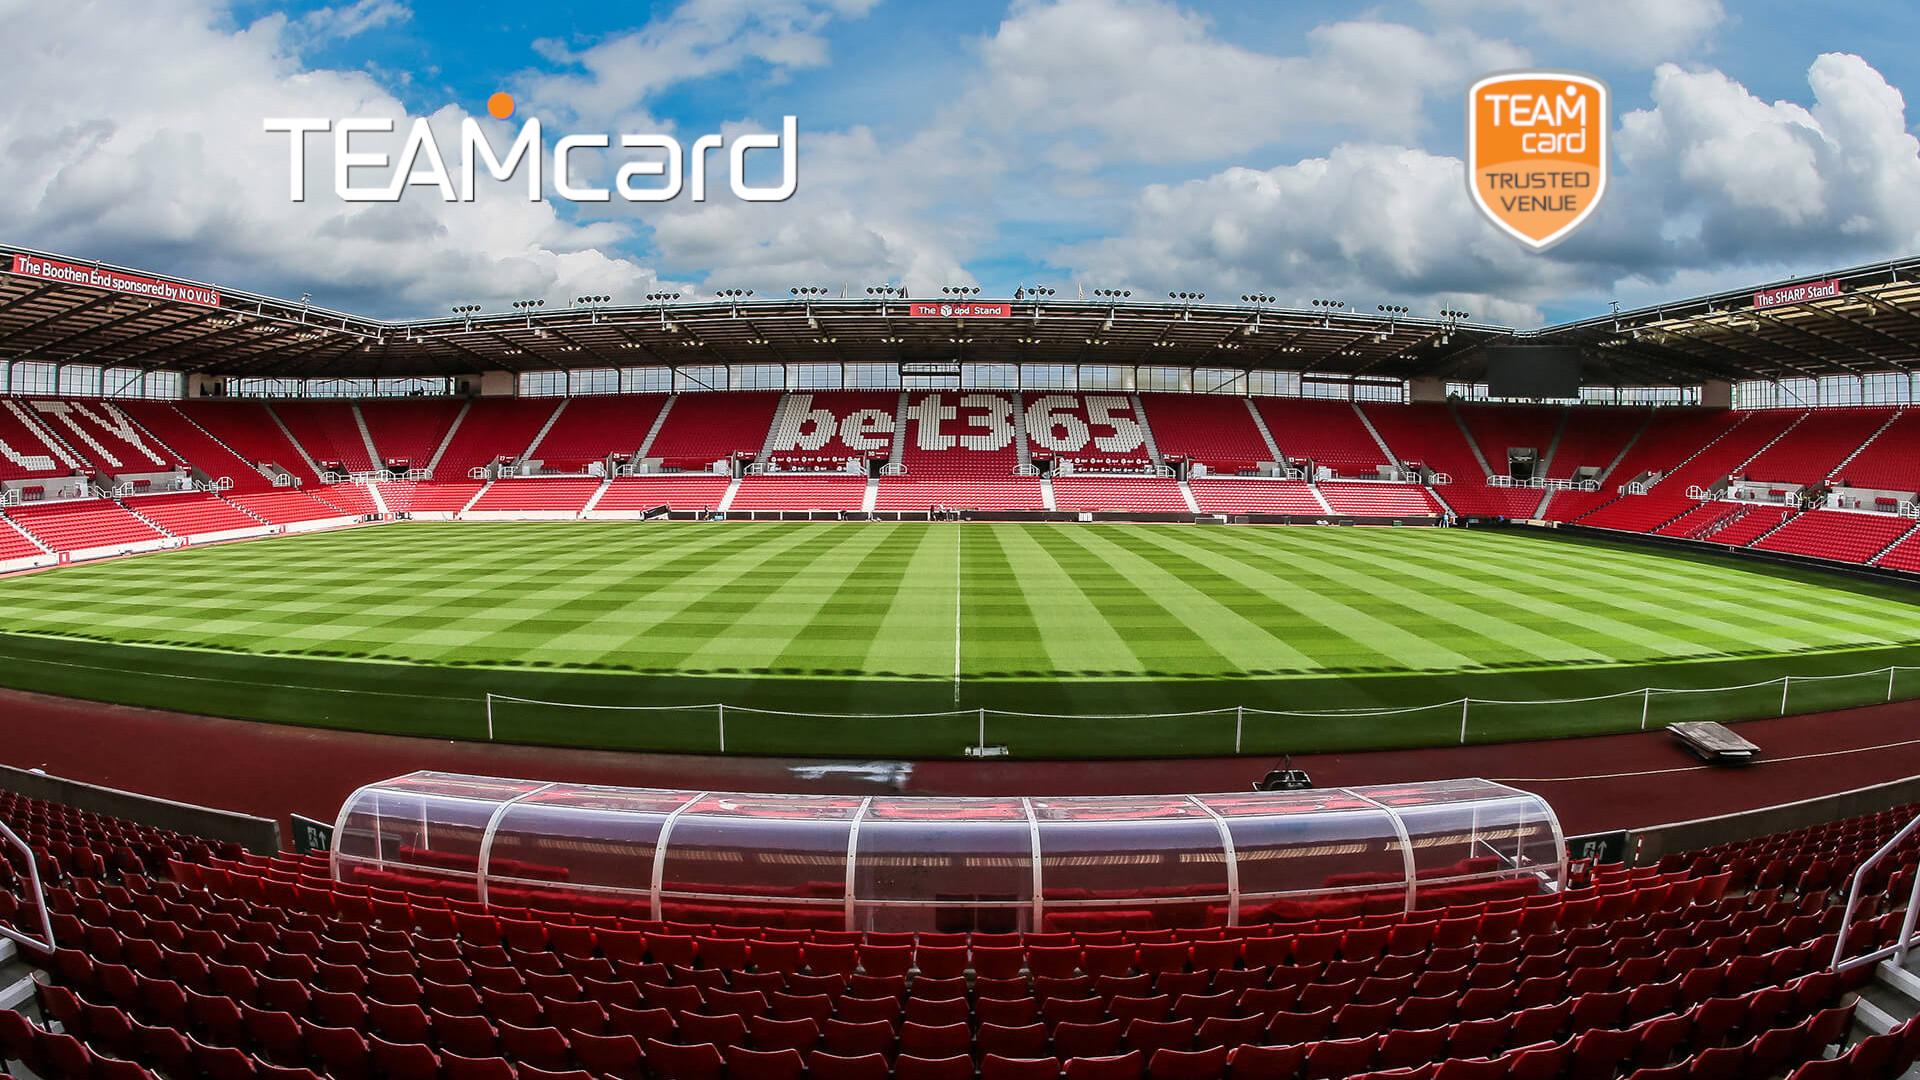 Stoke City Bet 365 Stadium